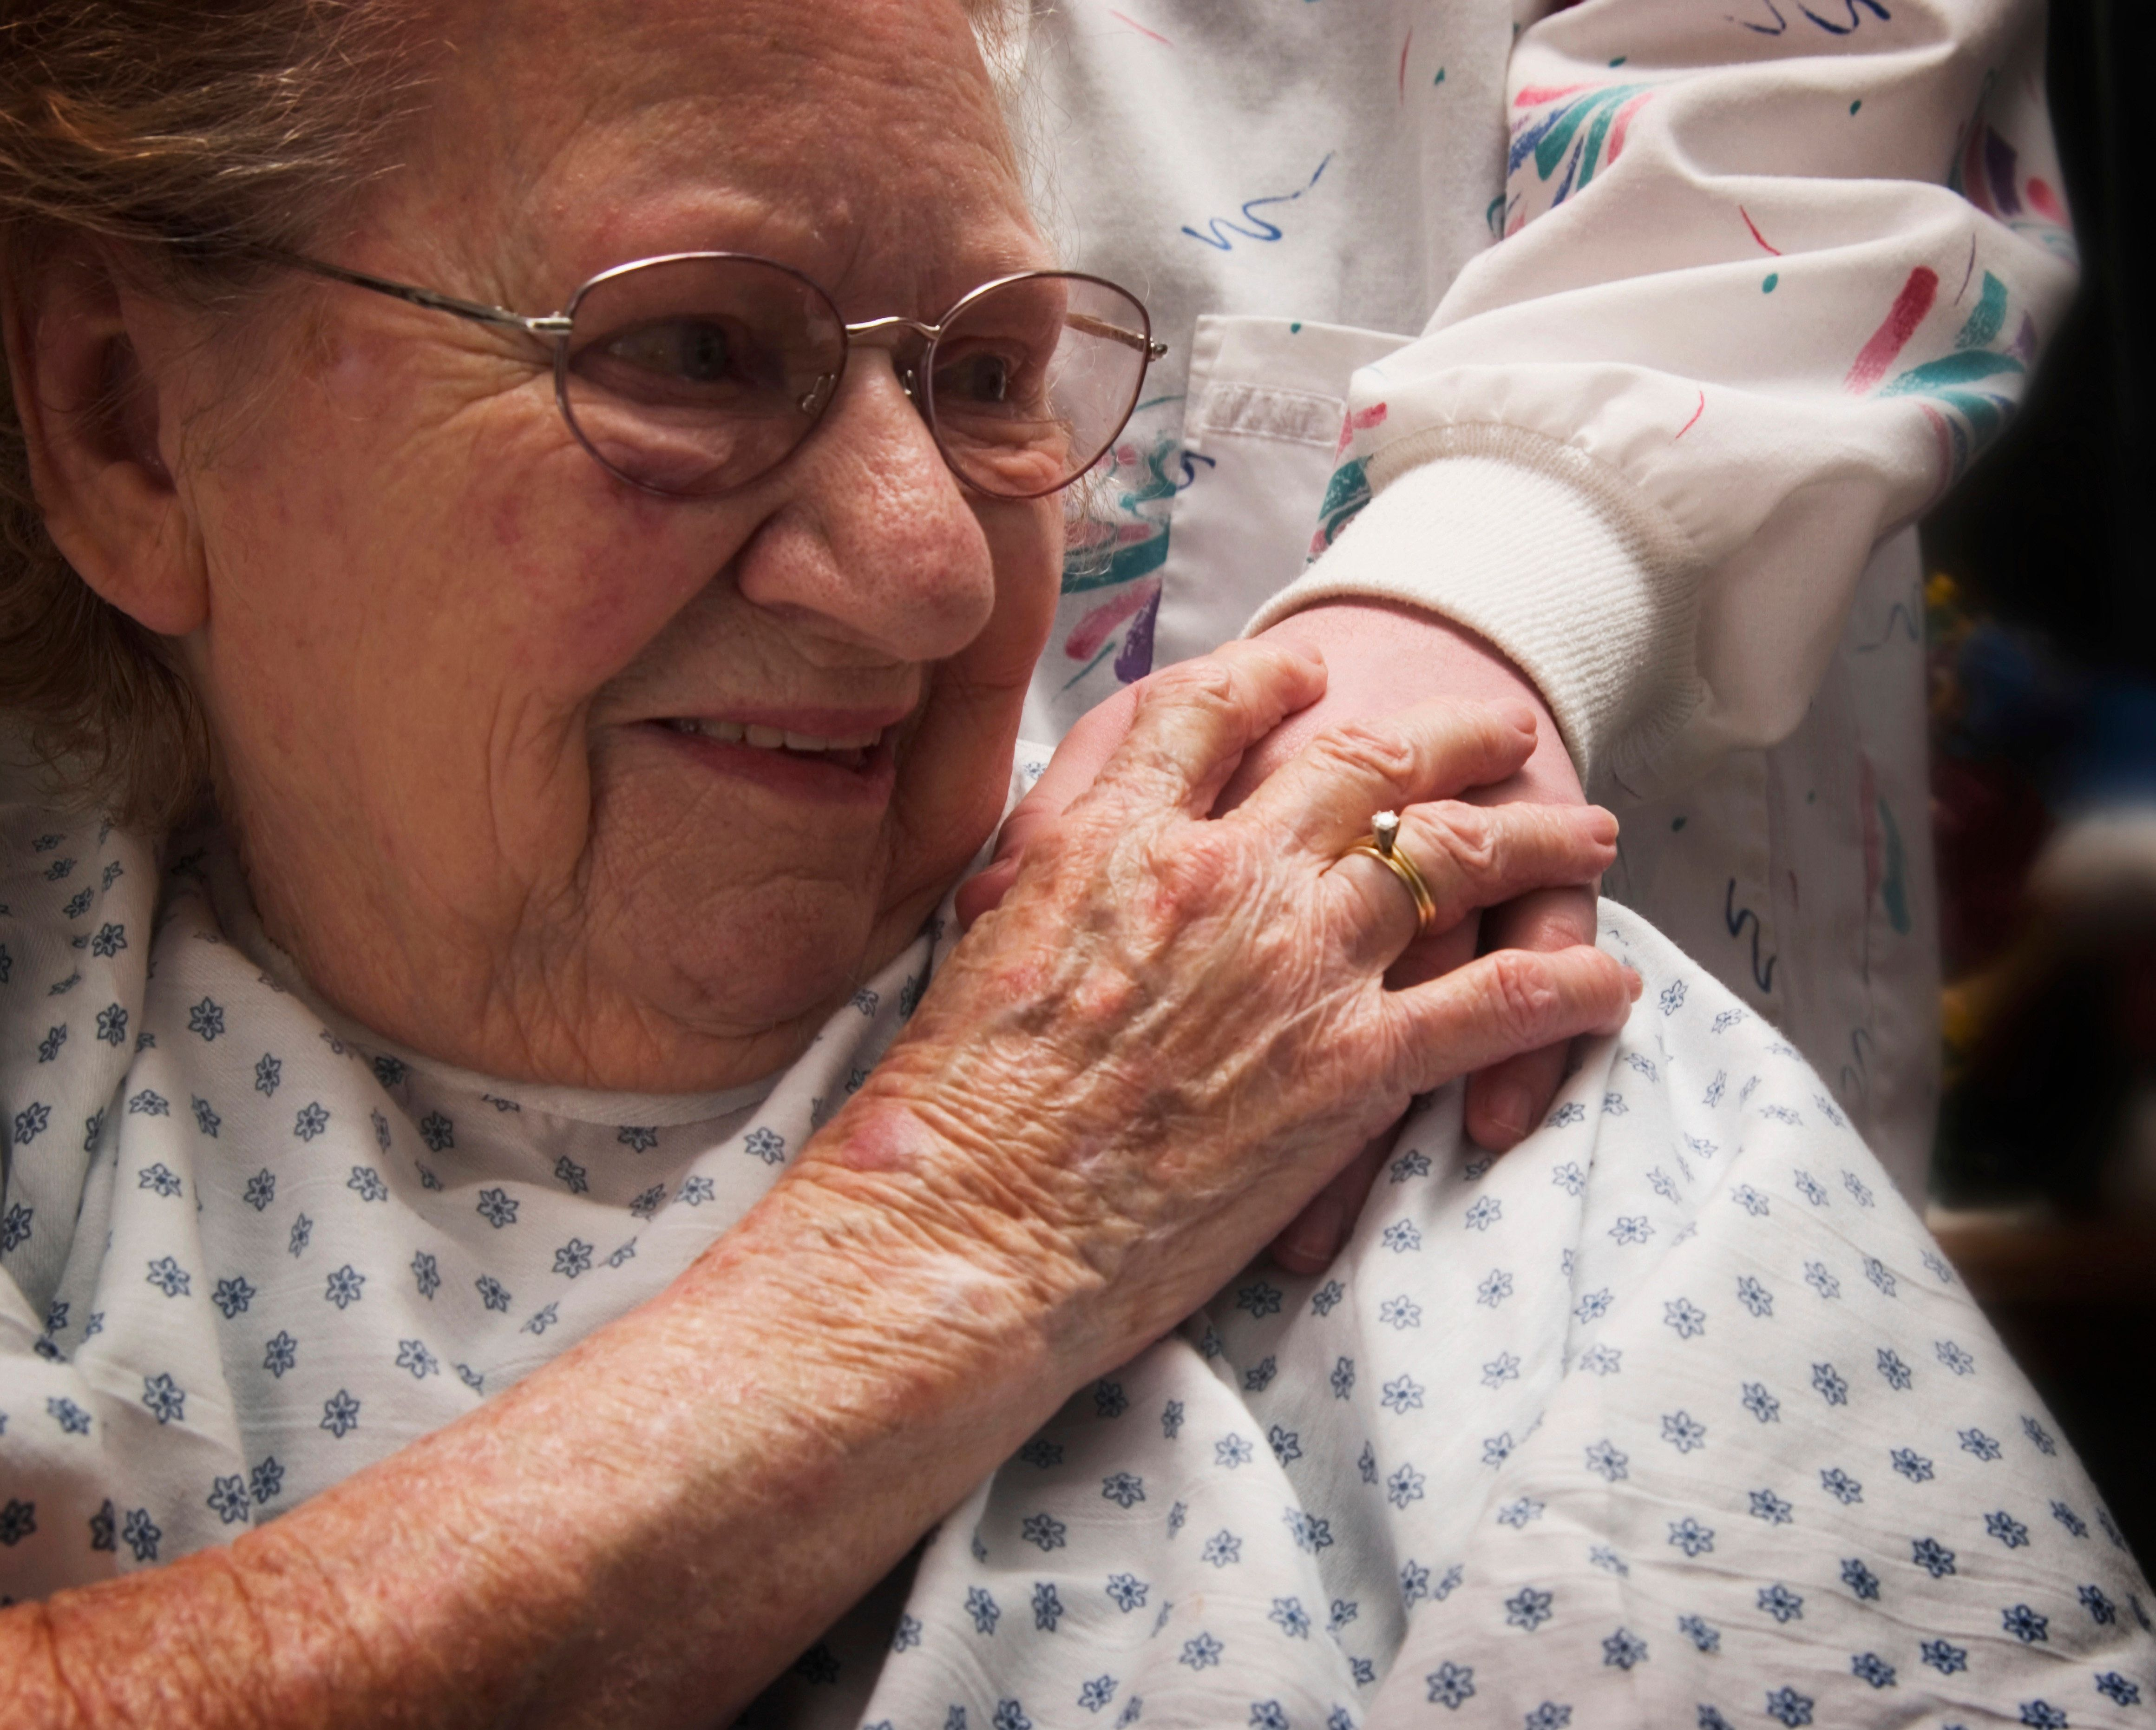 Nurse touching senior woman's shoulder